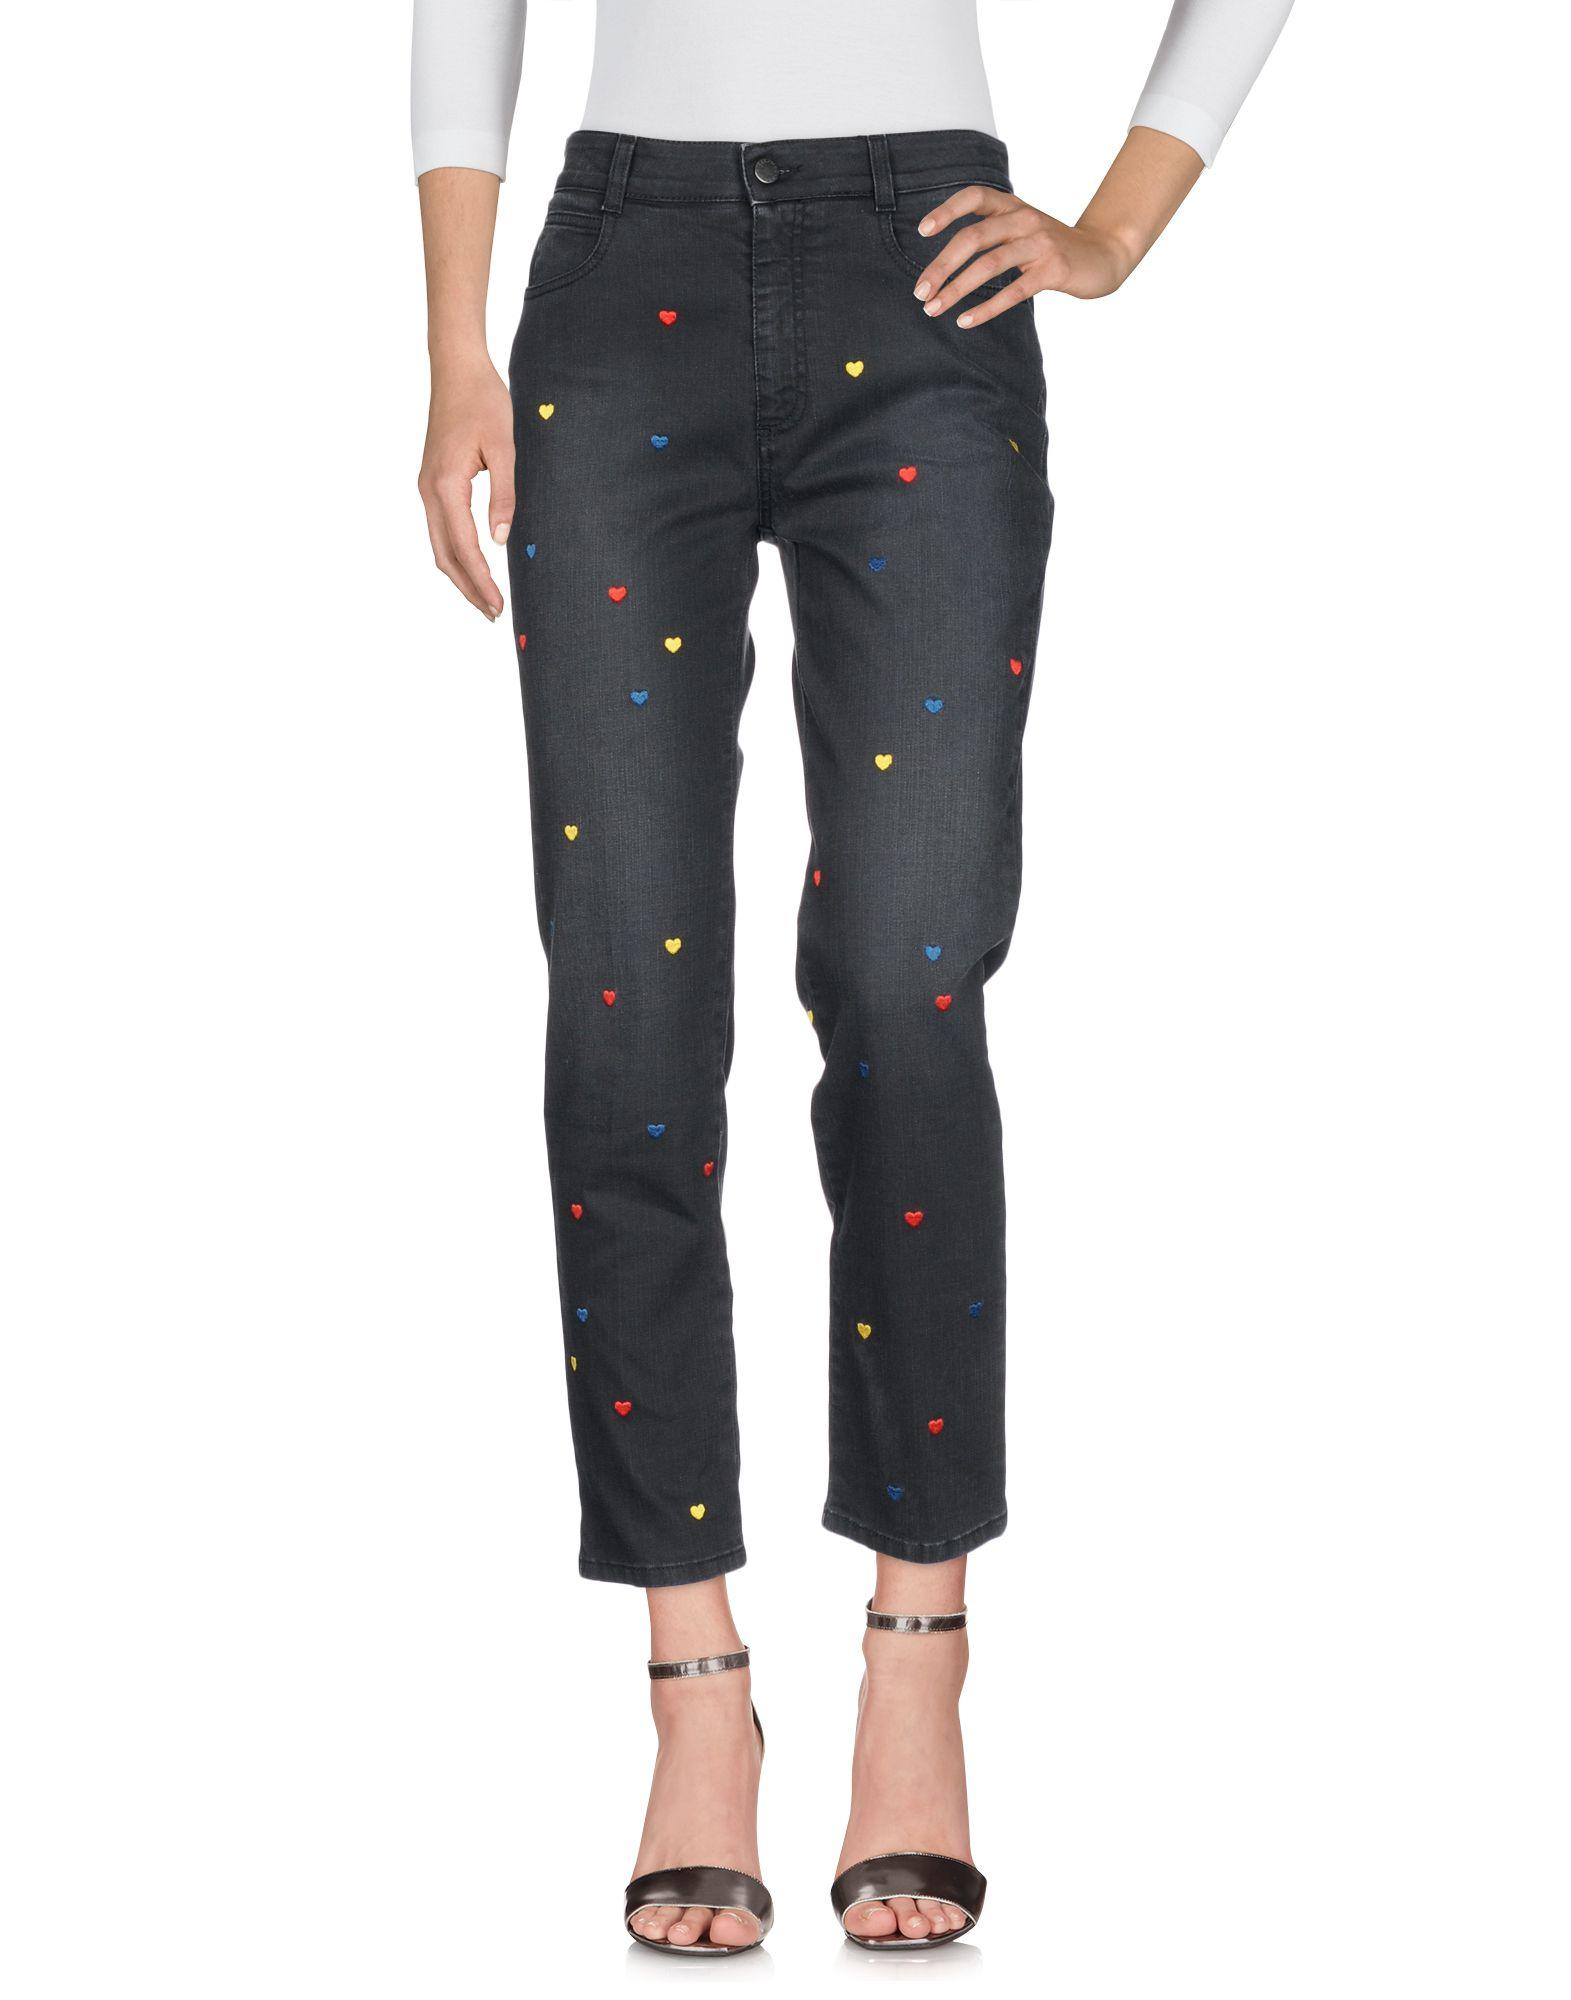 Pantaloni Jeans Stella Mccartney Donna - Acquista online su QVN5uL